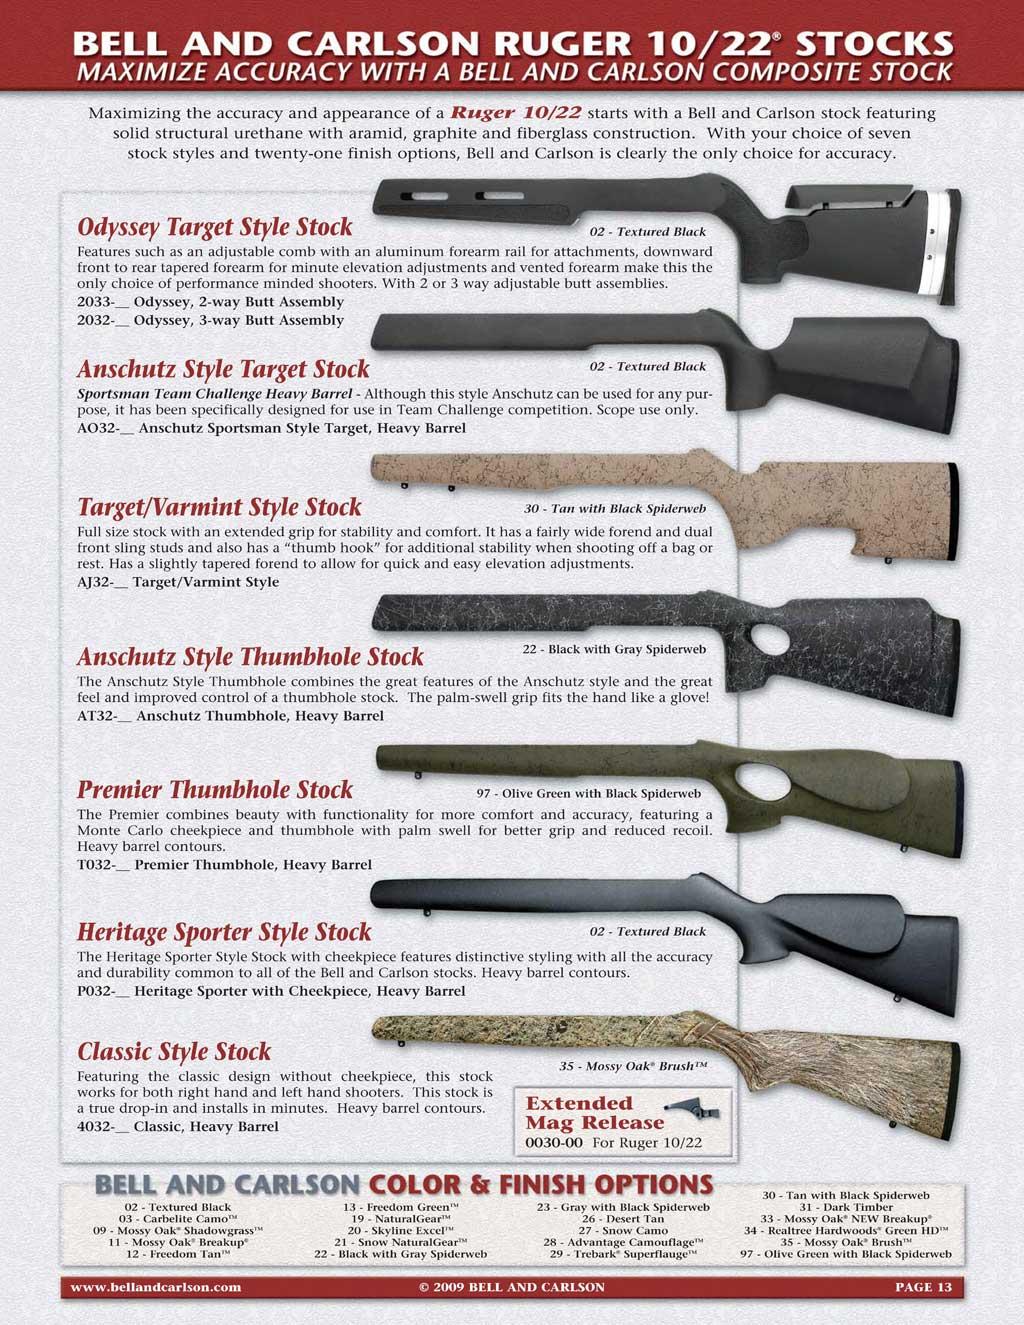 My 10/22 Stock Choice for the Clark Custom 10/22 – Bell & Carlson 2033Odyssey Target Stock